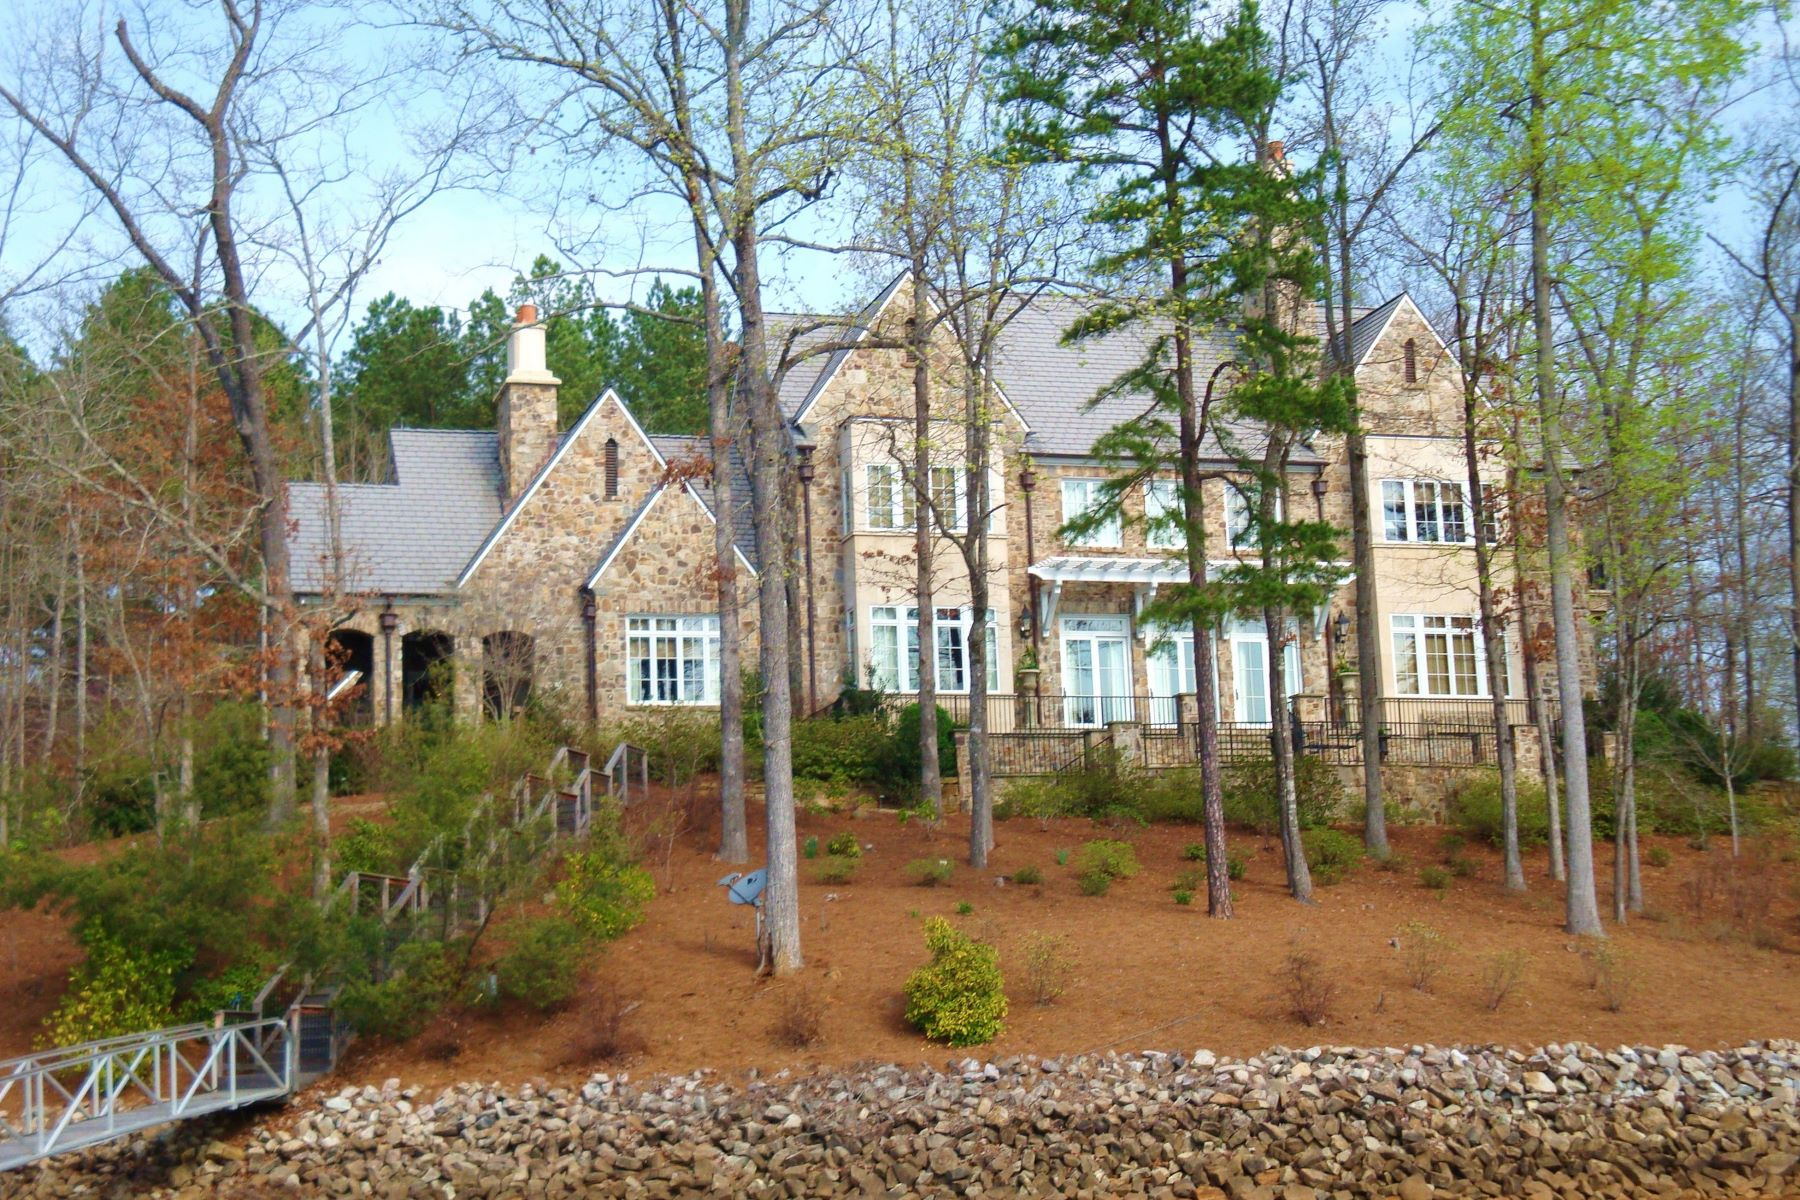 Villa per Vendita alle ore Timeless Architecture 914 Rippling Water Way The Cliffs At Keowee Falls, Salem, Carolina Del Sud, 29676 Stati Uniti